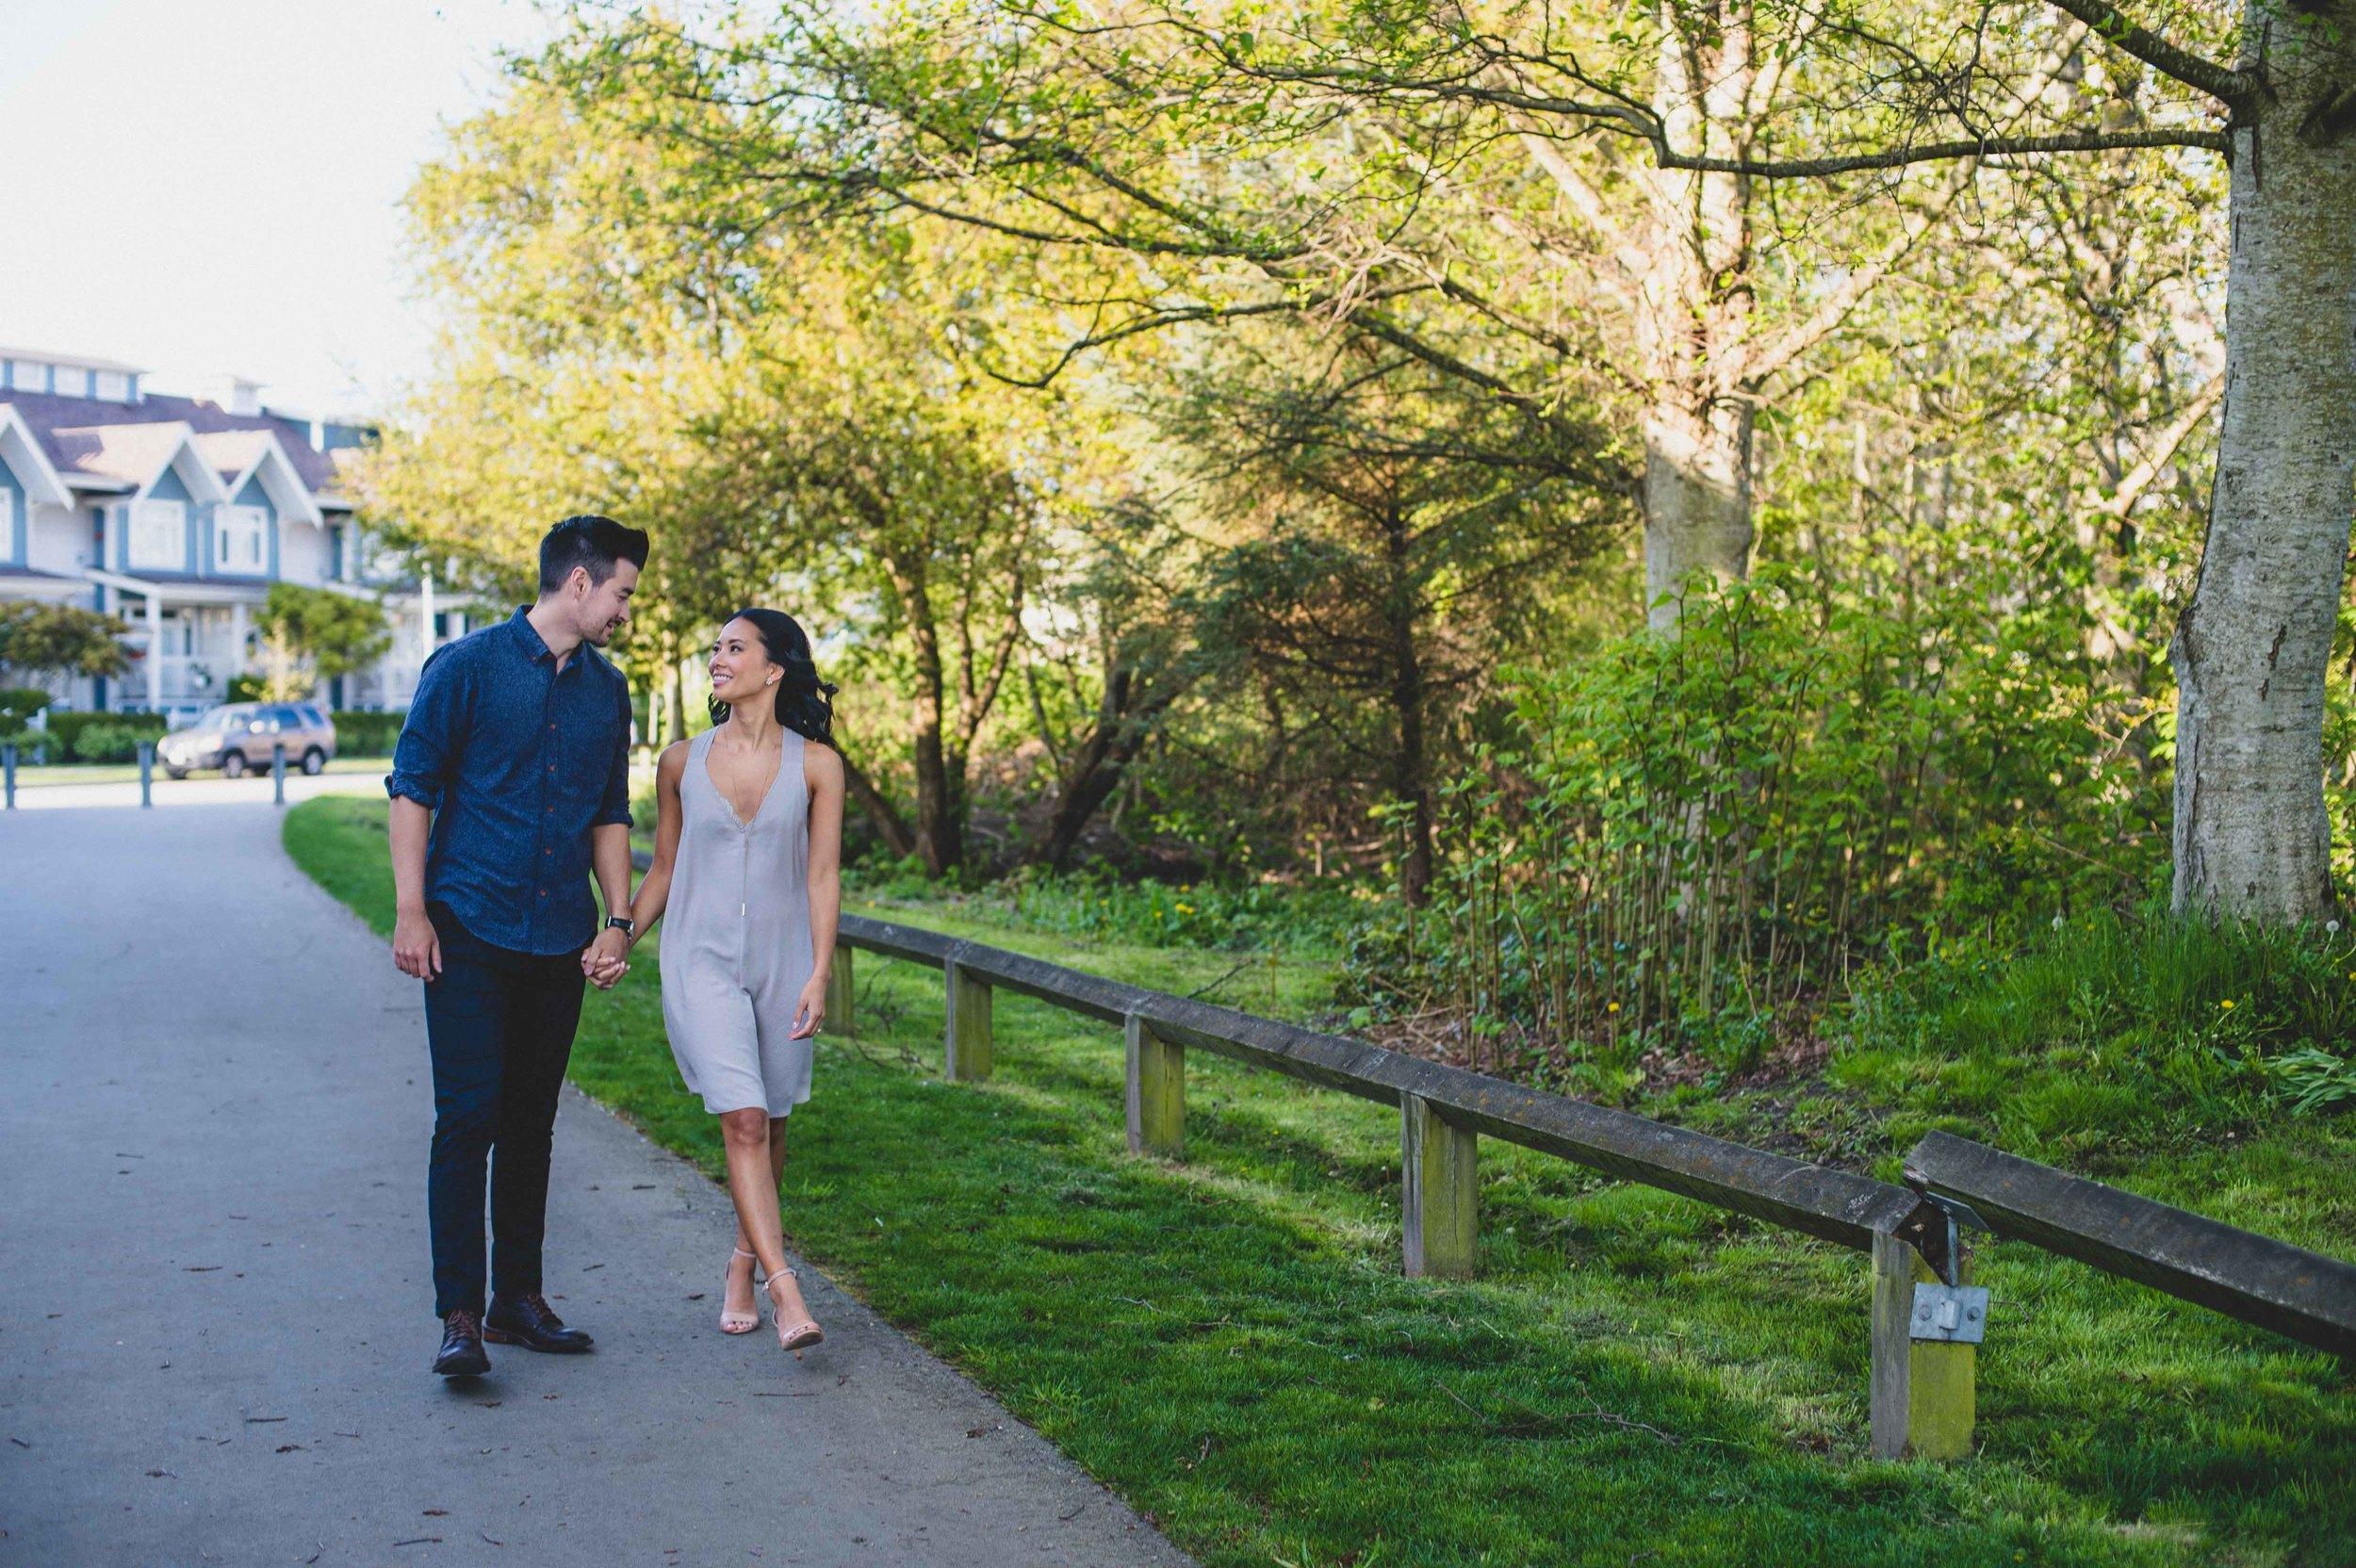 Vaccouver Steveston engagement photography Edward Lai Photography-6.jpg